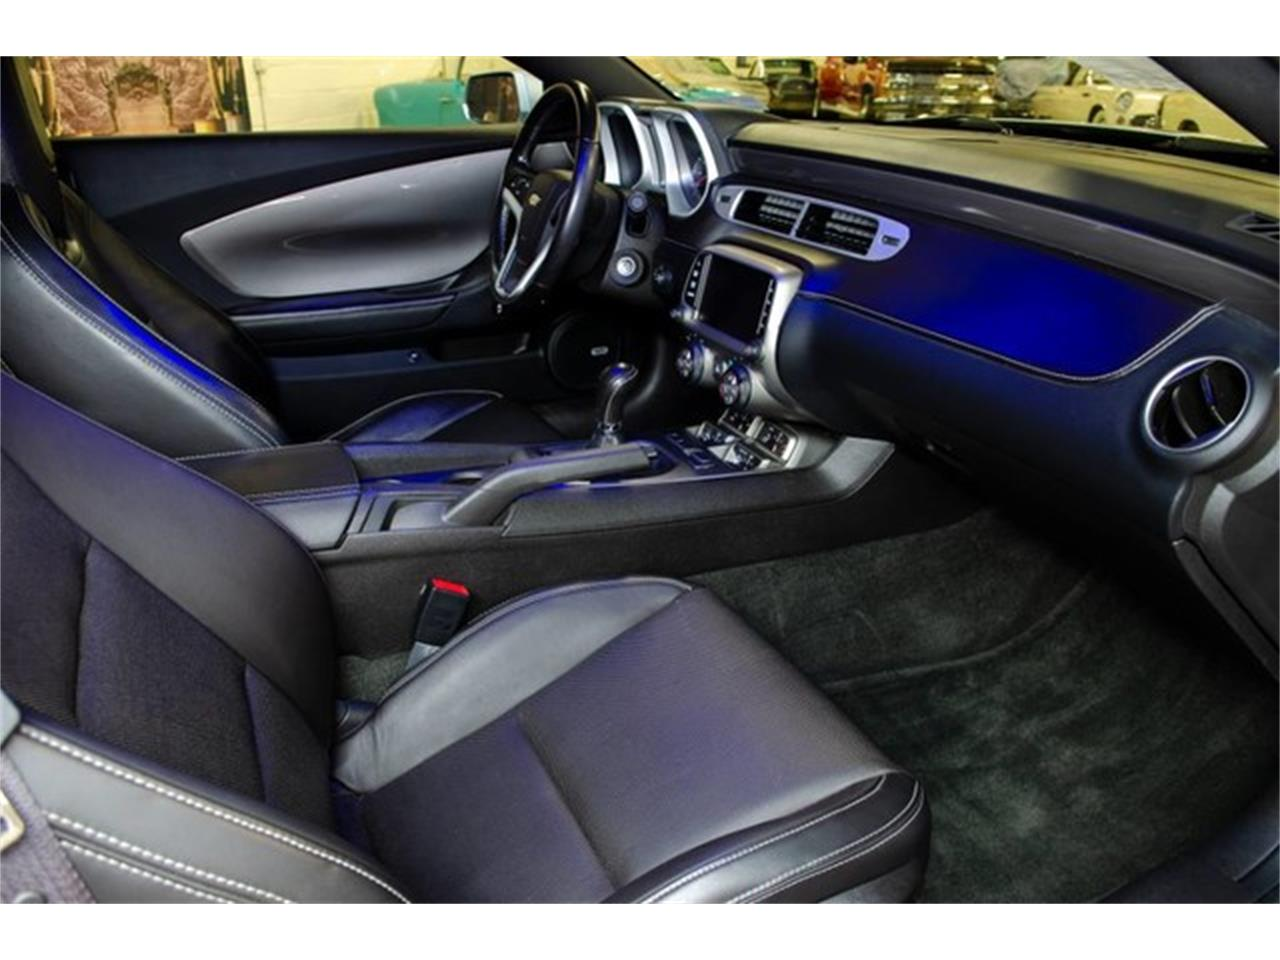 2013 Chevrolet Camaro (CC-1343843) for sale in Bristol, Pennsylvania